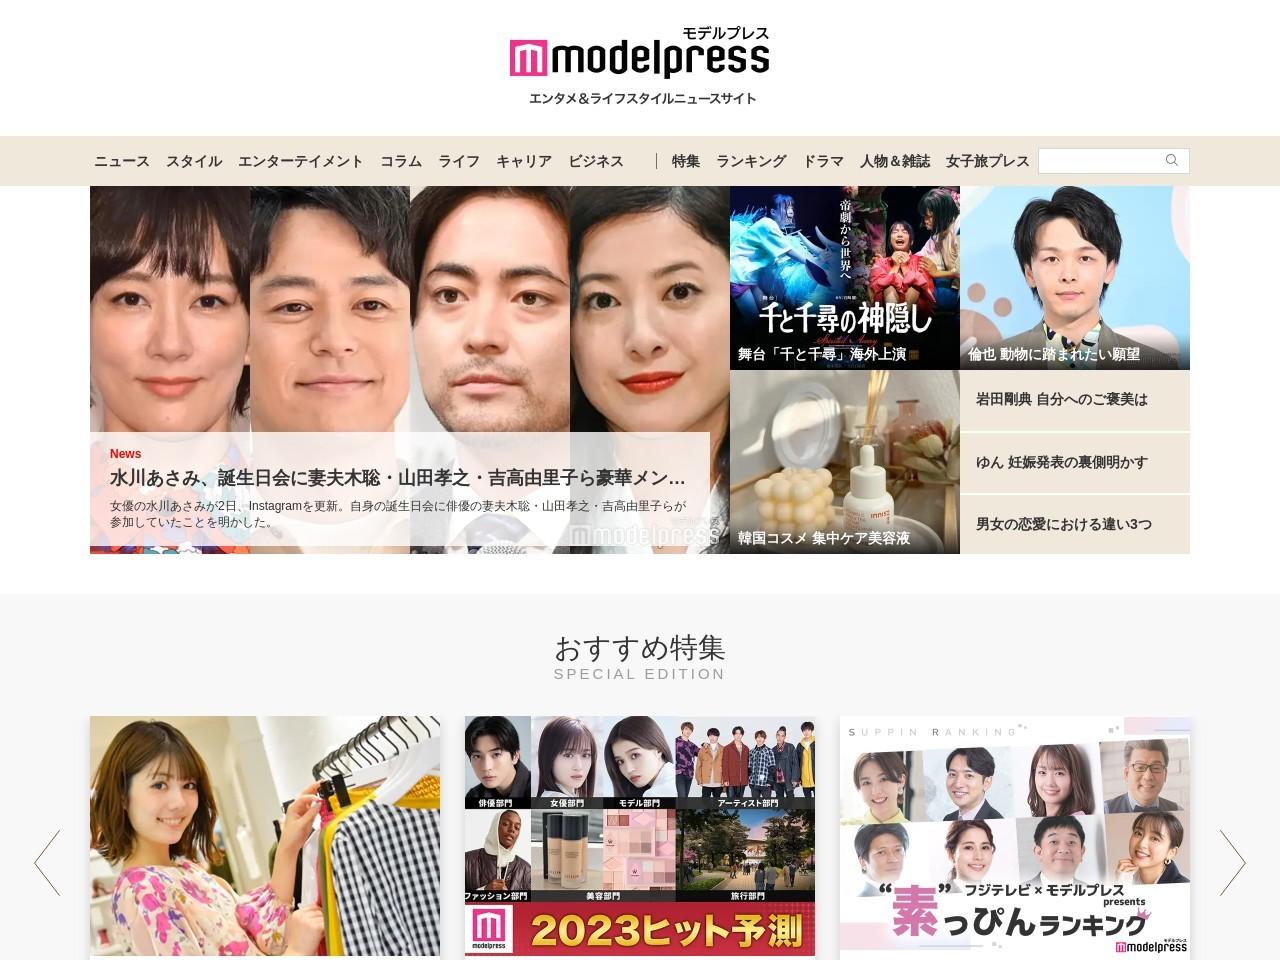 「PRODUCE48」AKB48下尾みう、韓国で異例の注目度 妖艶ダンス動画の再生数が話題に …